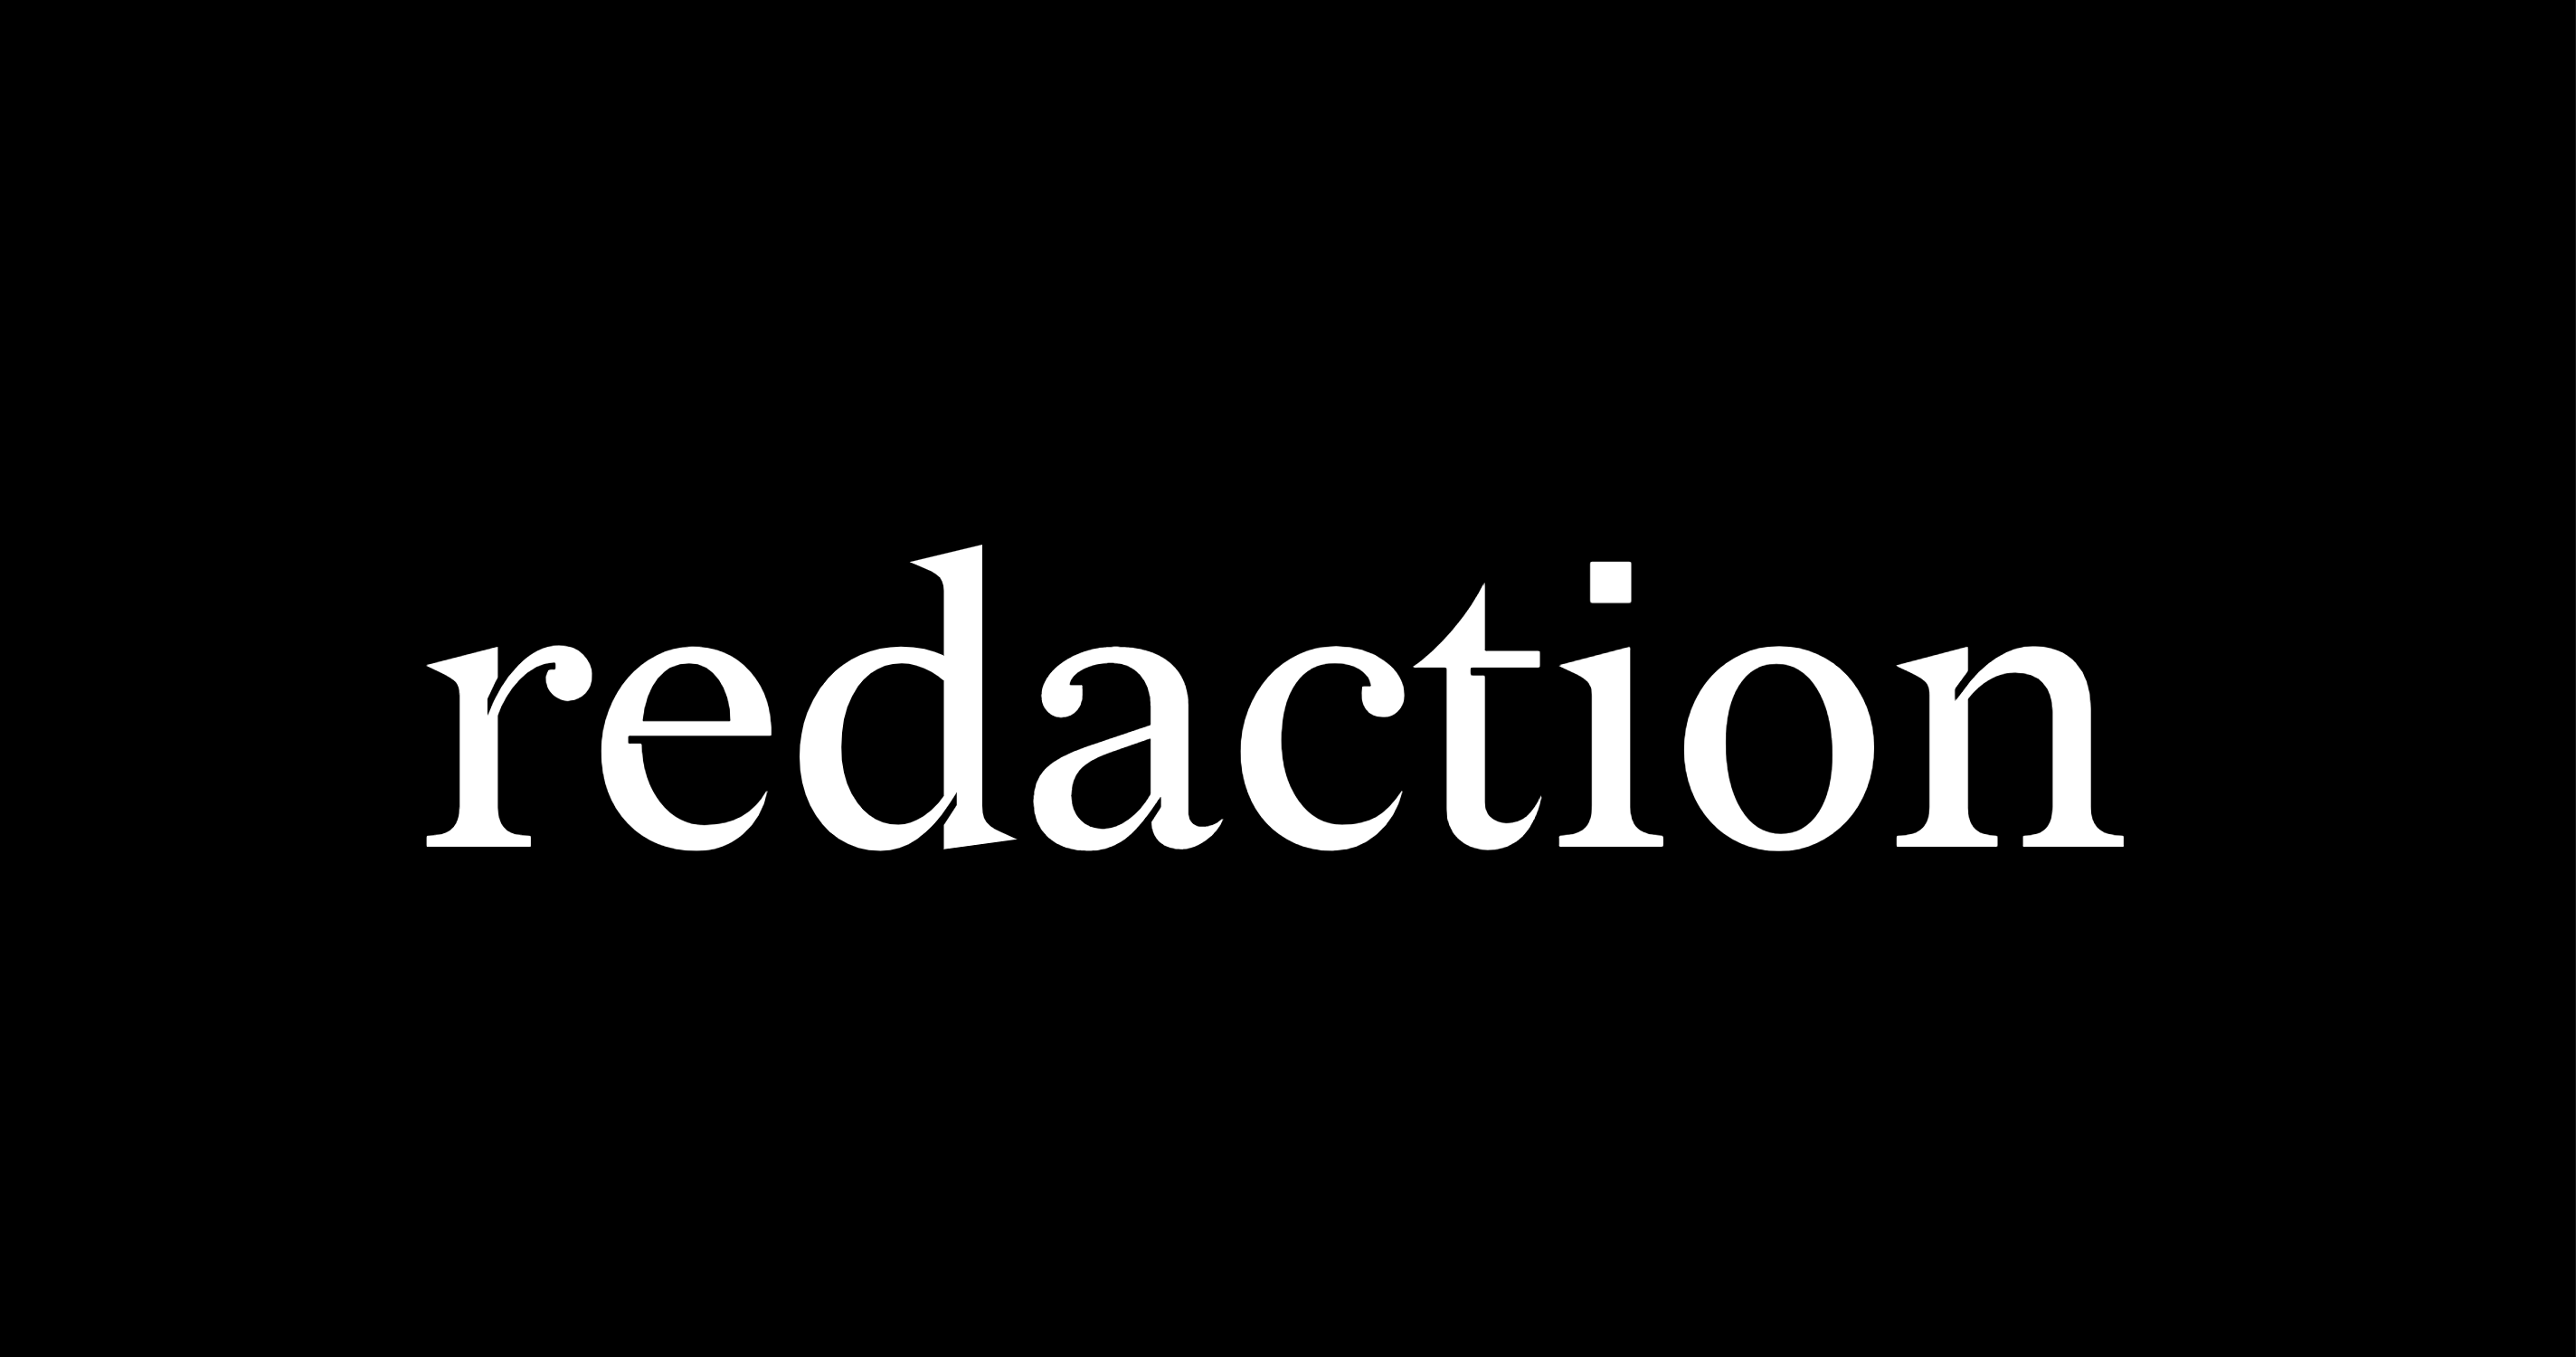 Redaction | Typeface from Titus Kaphar / Reginald Dwayne